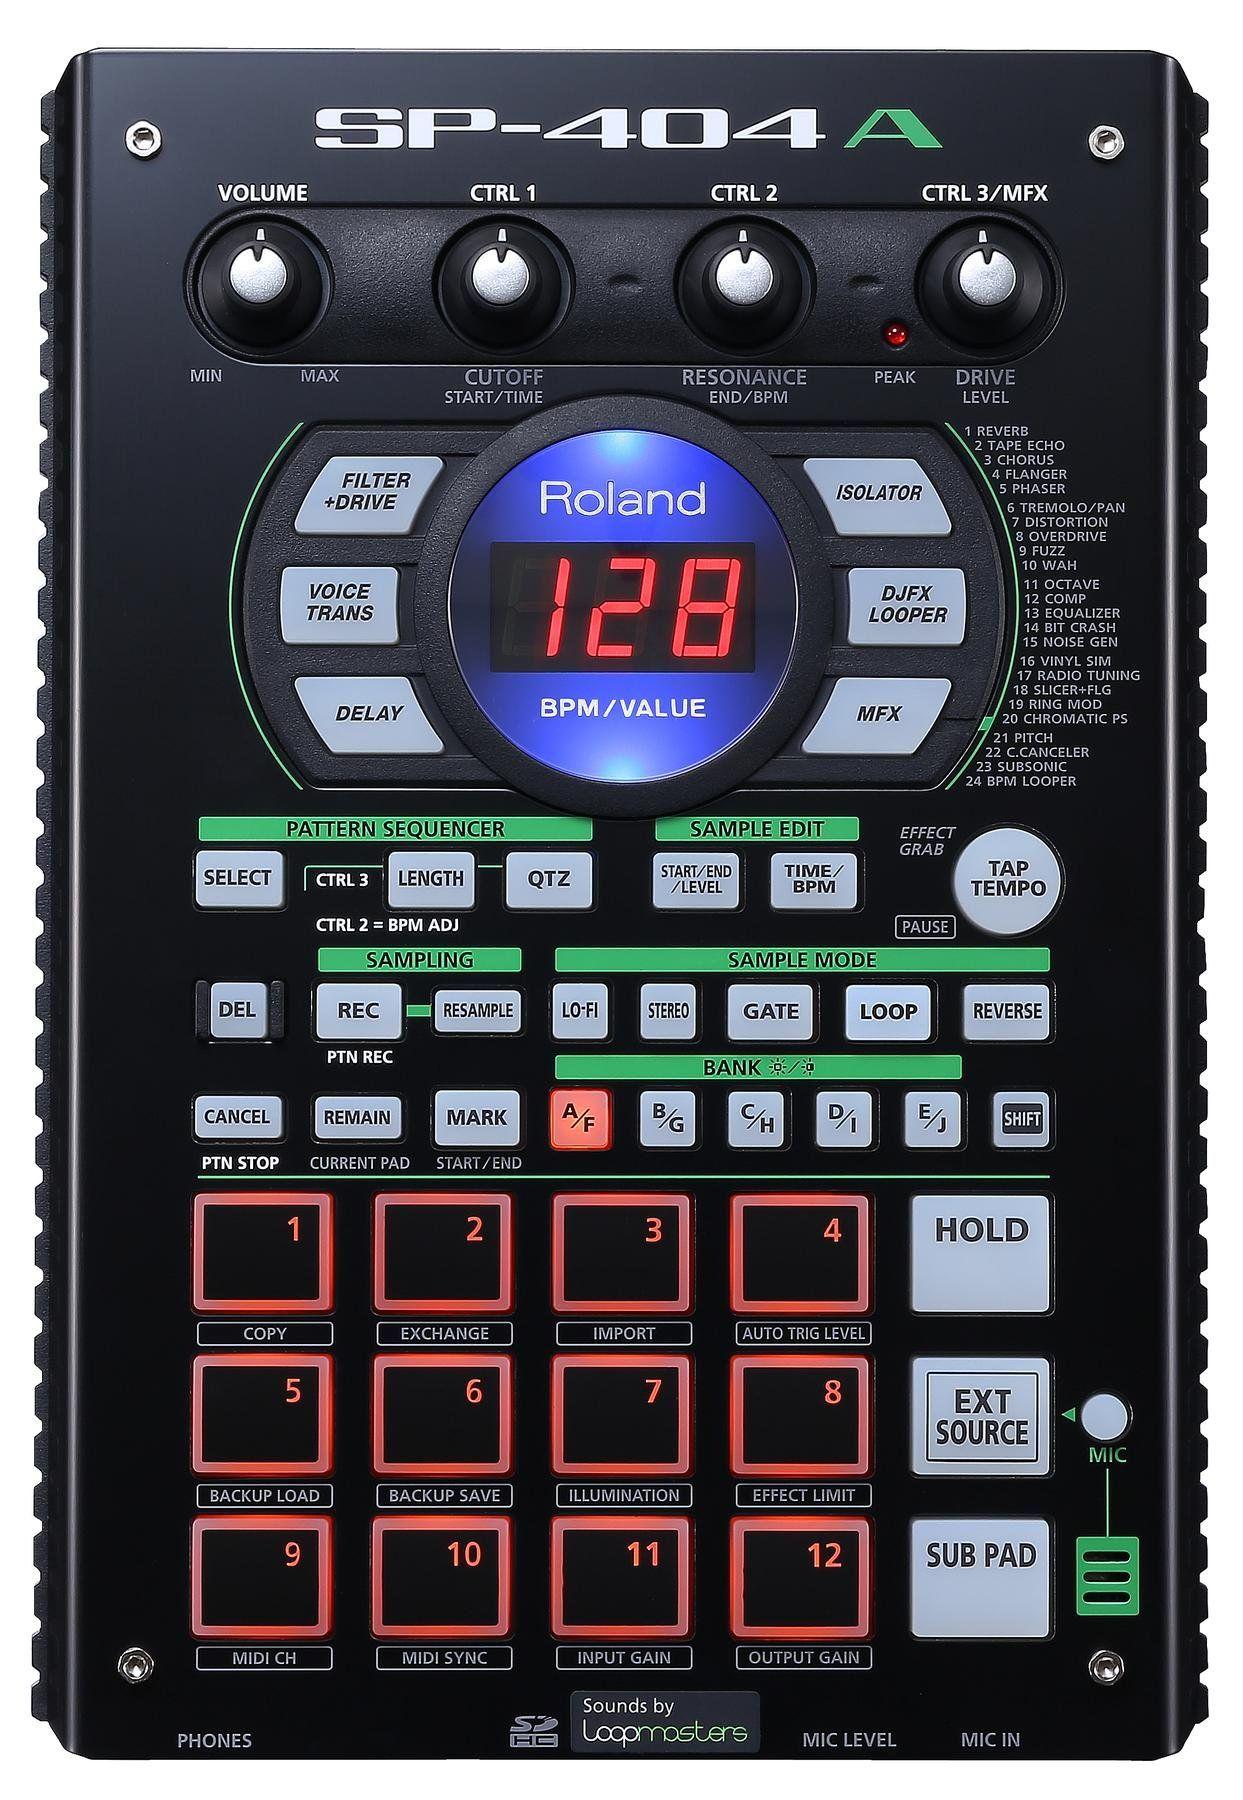 roland sp 404a linear wave sampler in 2019 playground drum machine dj gear drum patterns. Black Bedroom Furniture Sets. Home Design Ideas